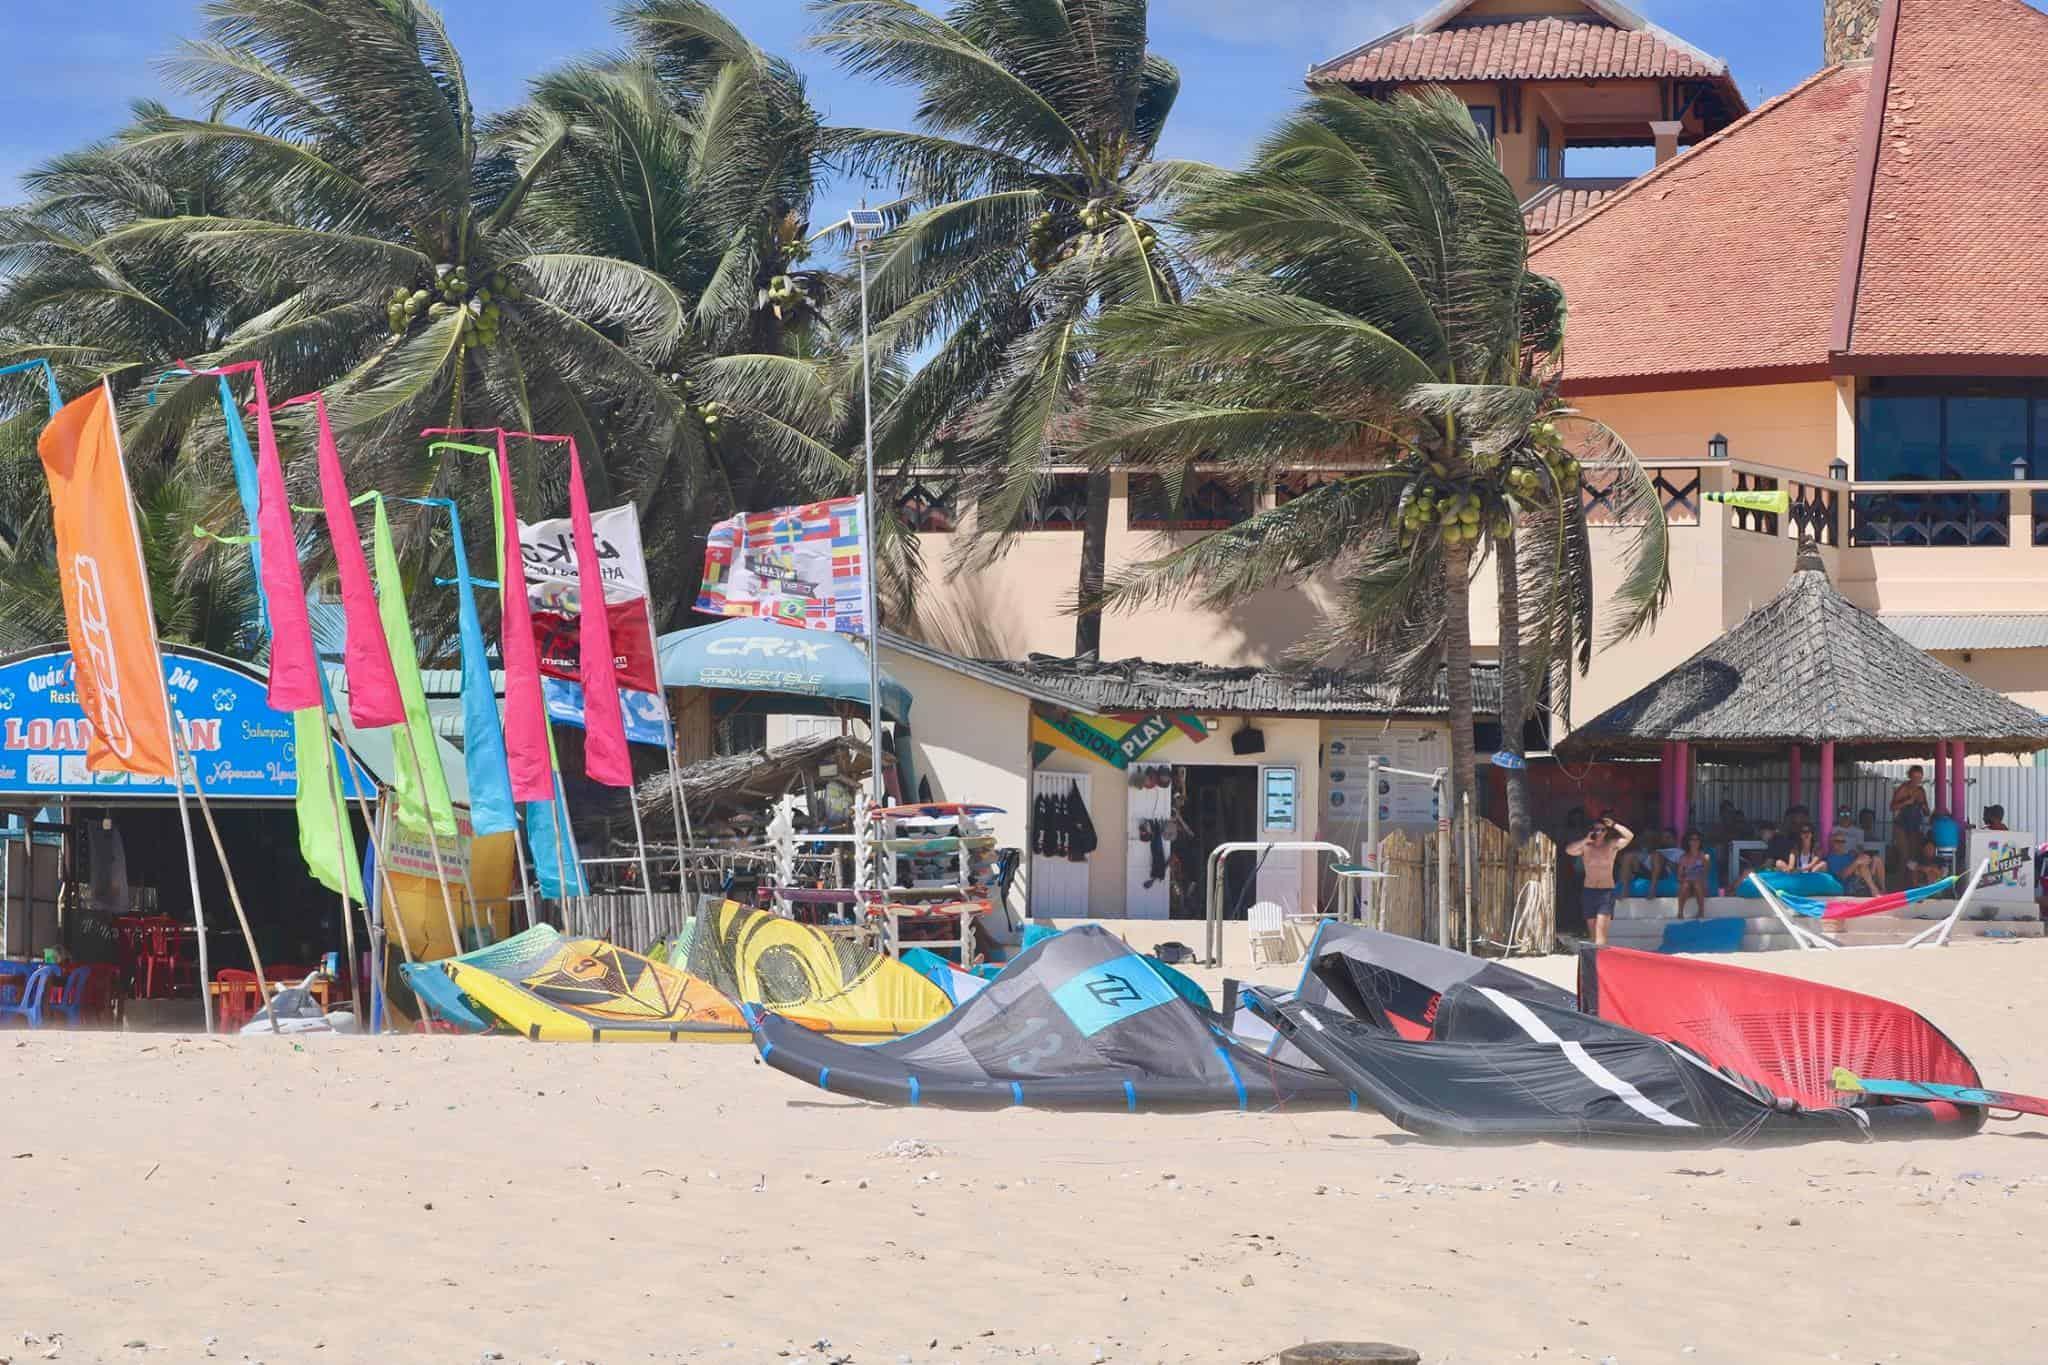 C2Sky kite center - a Mui ne kitesurfing school